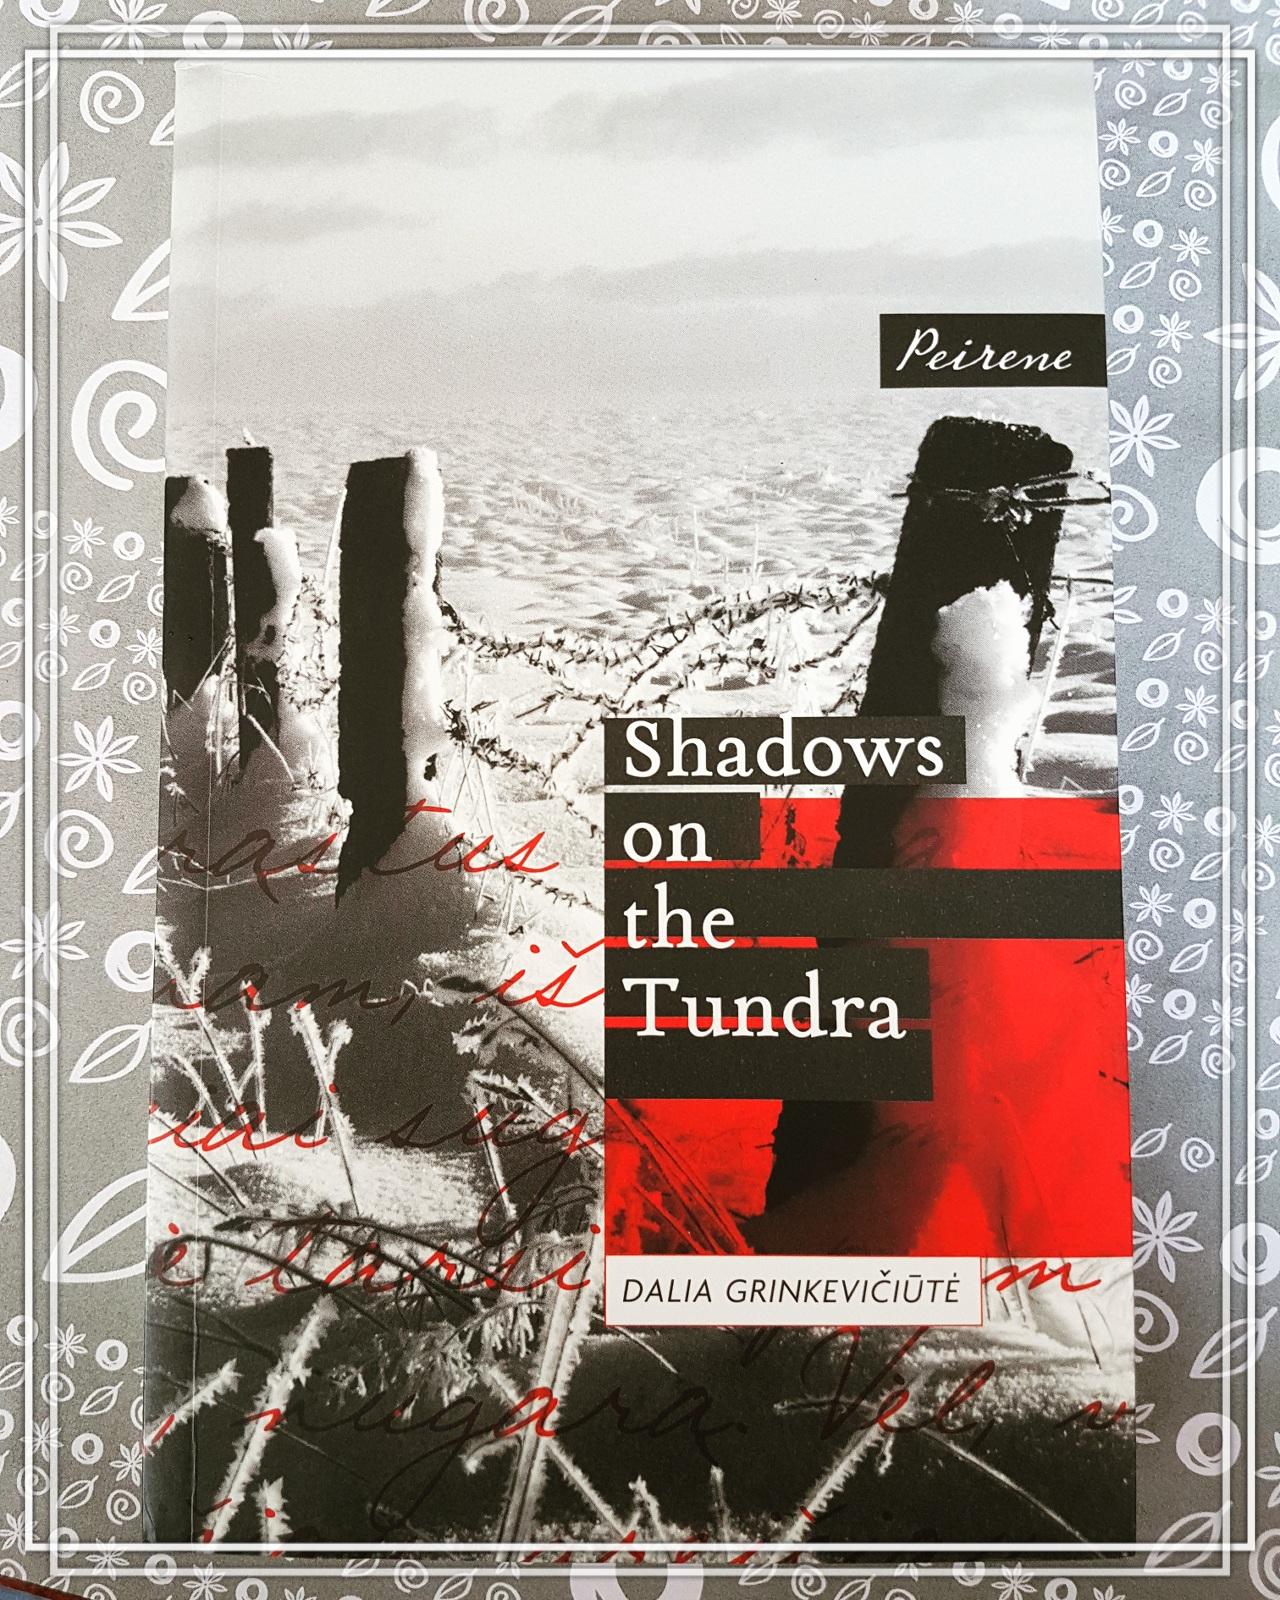 Shadows on the Tundra